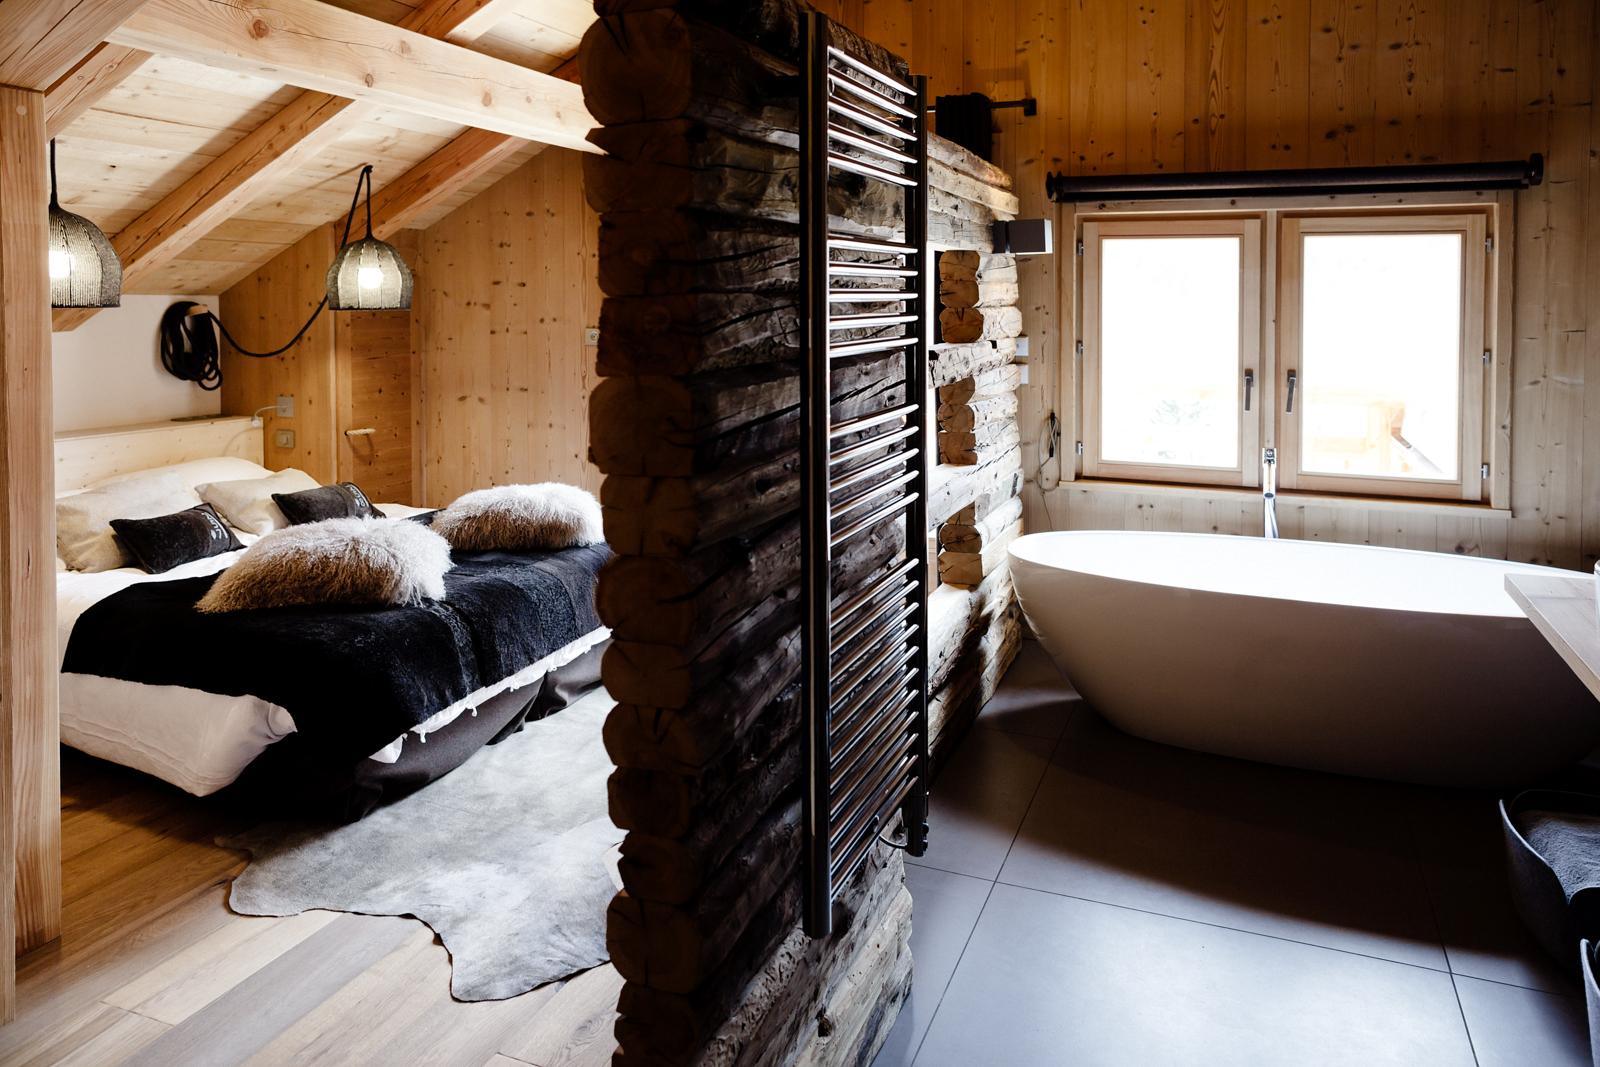 serre chevalier luxury chalet rentals ski slopes concierge services